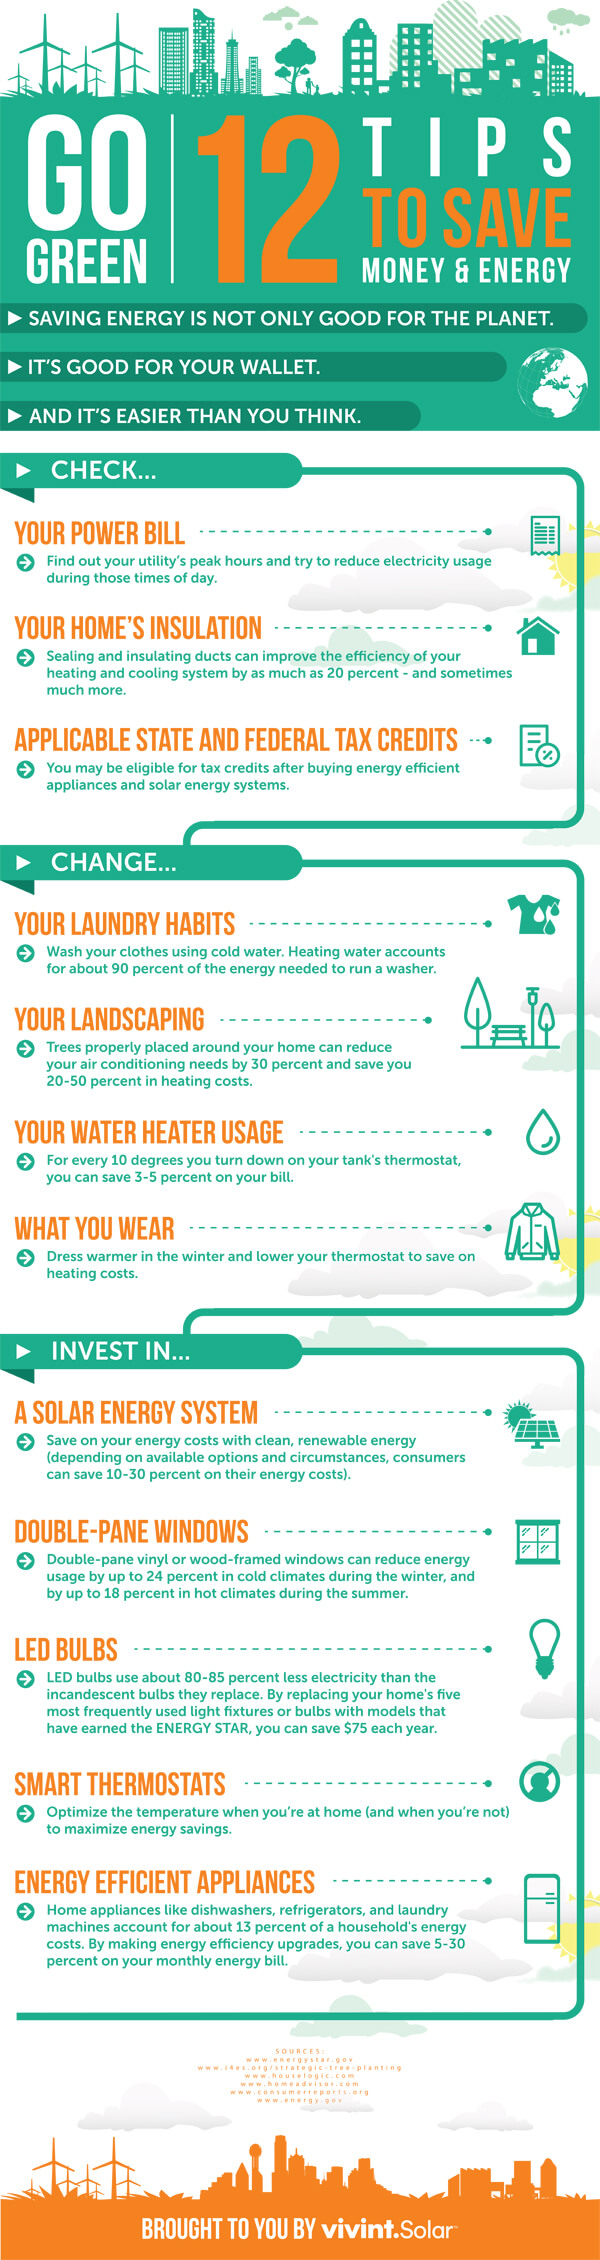 12 Ways to Save Money & Energy infographic